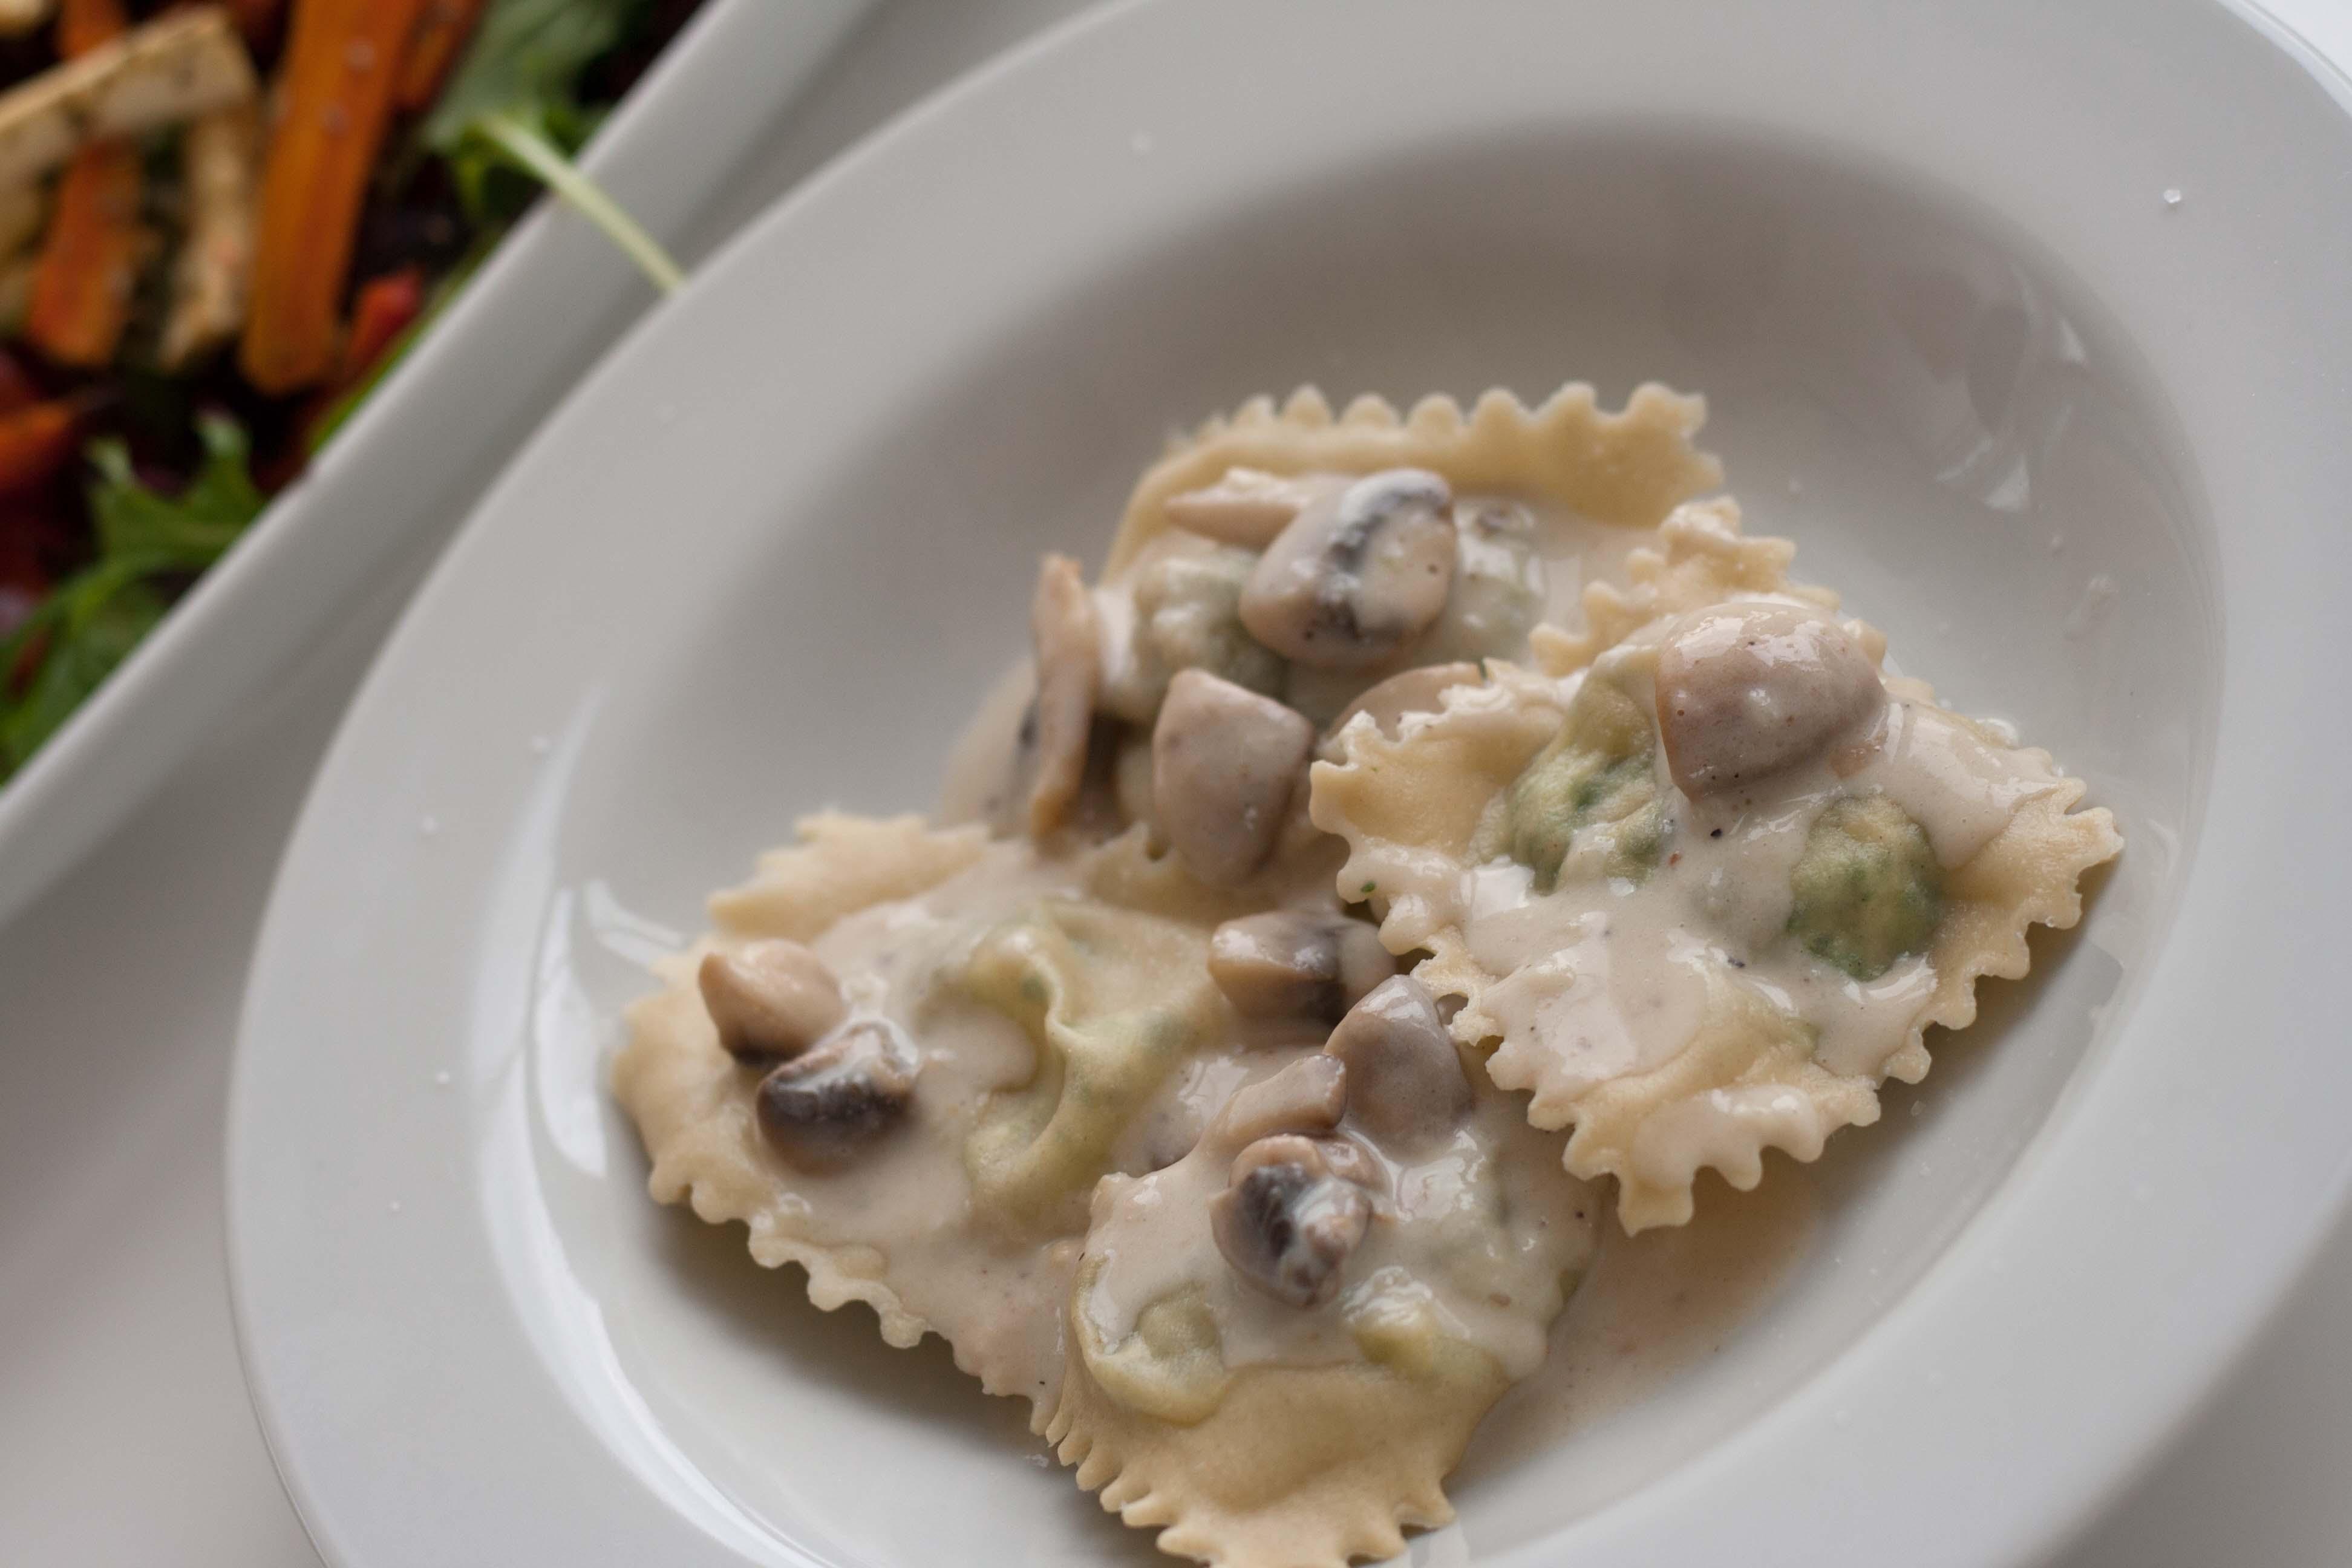 Opskrift på hjemmelavet Ravioli med ricotta og spinat med champignon/fløde sauce